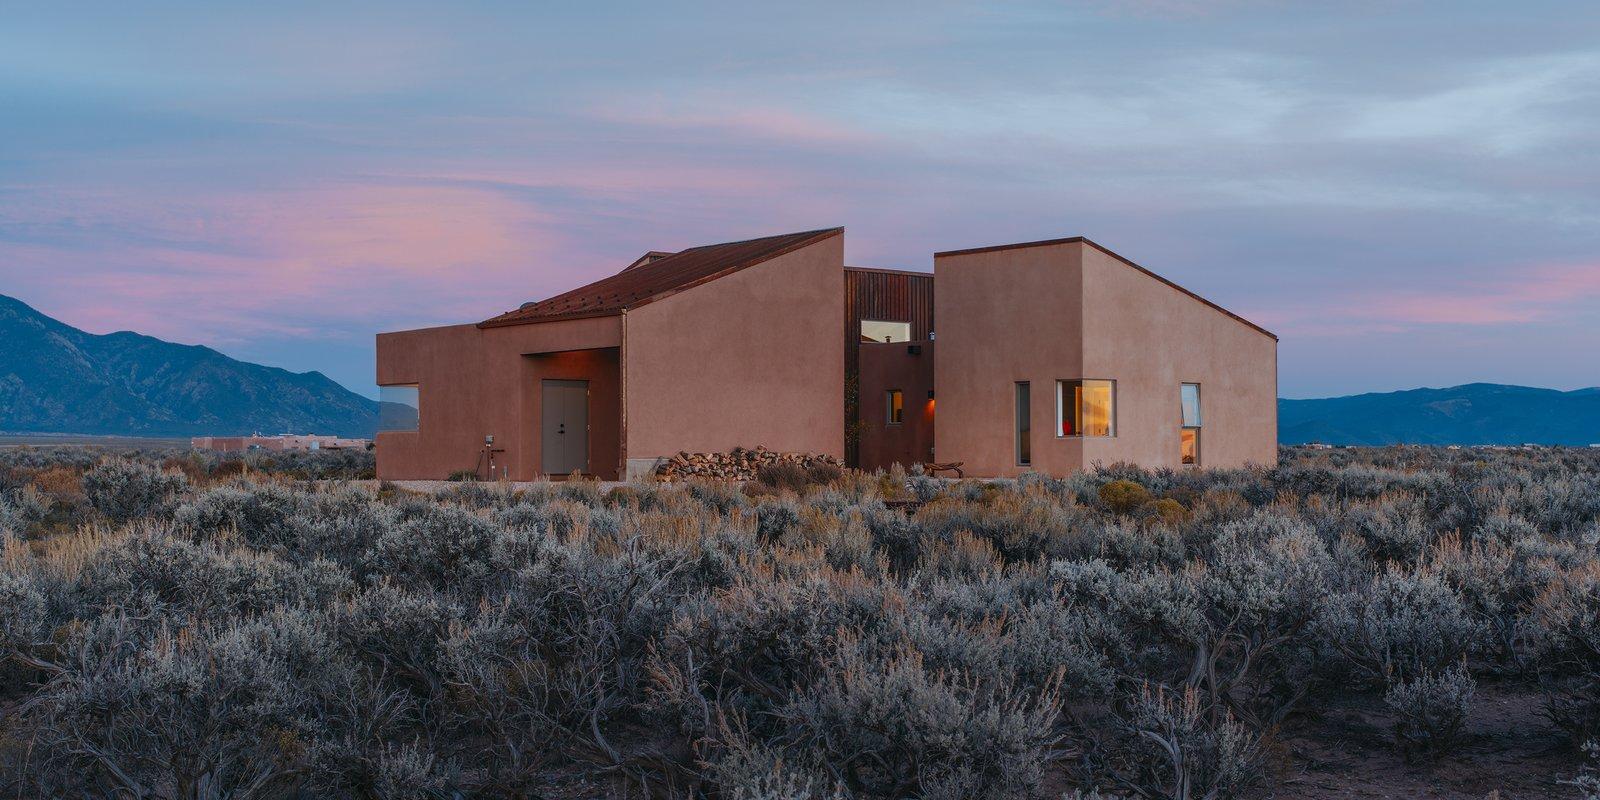 A Rookie Designer and Her Builder Father Create an Artist's Sculptural Loft in the Desert